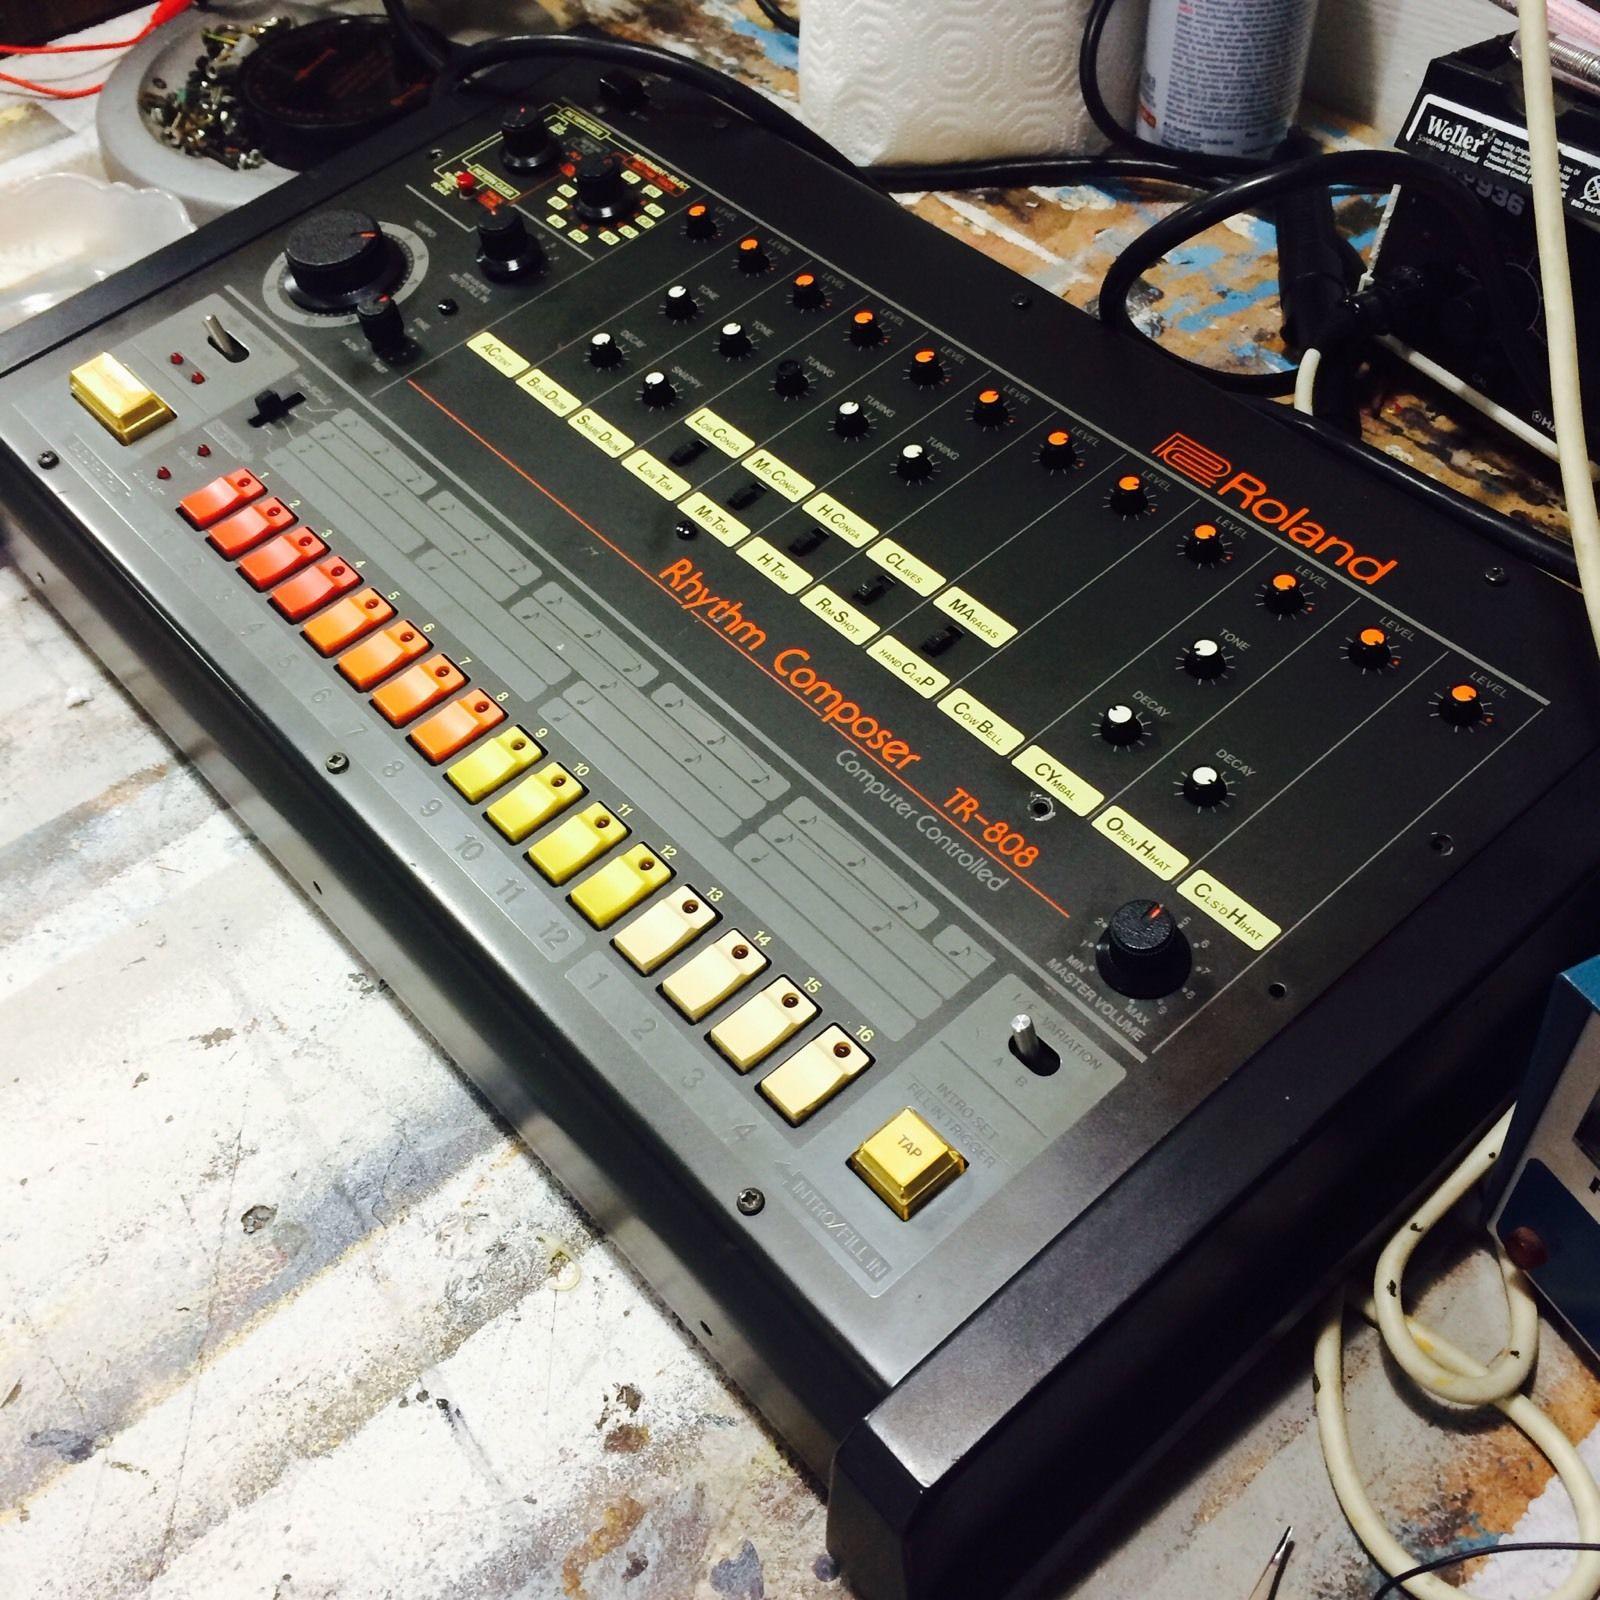 808 drum machine